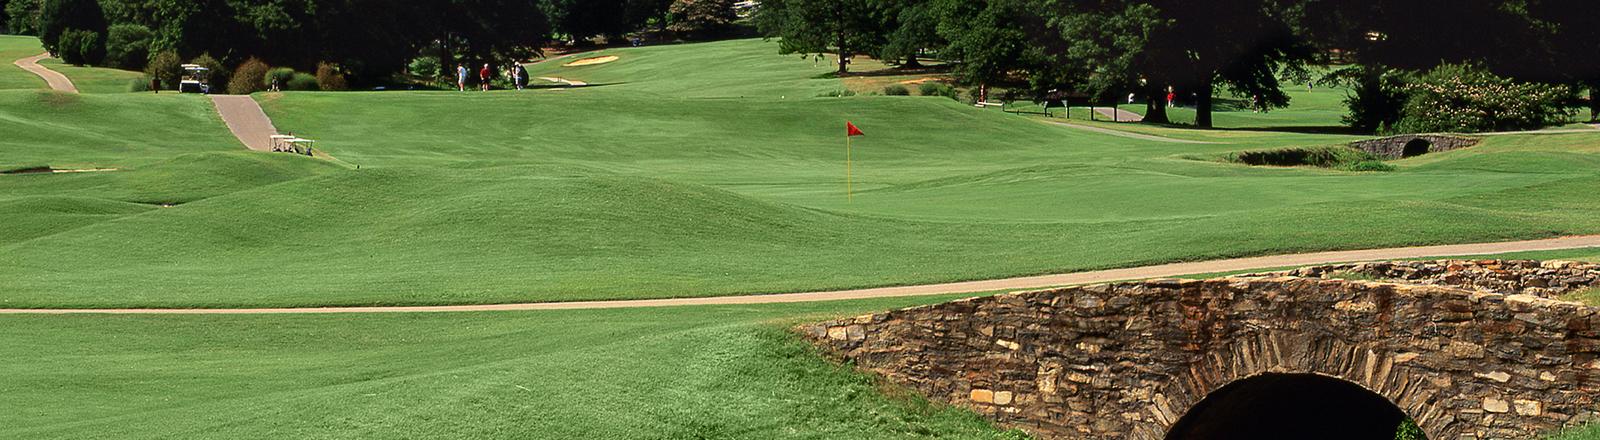 North Fulton Golf Course Header